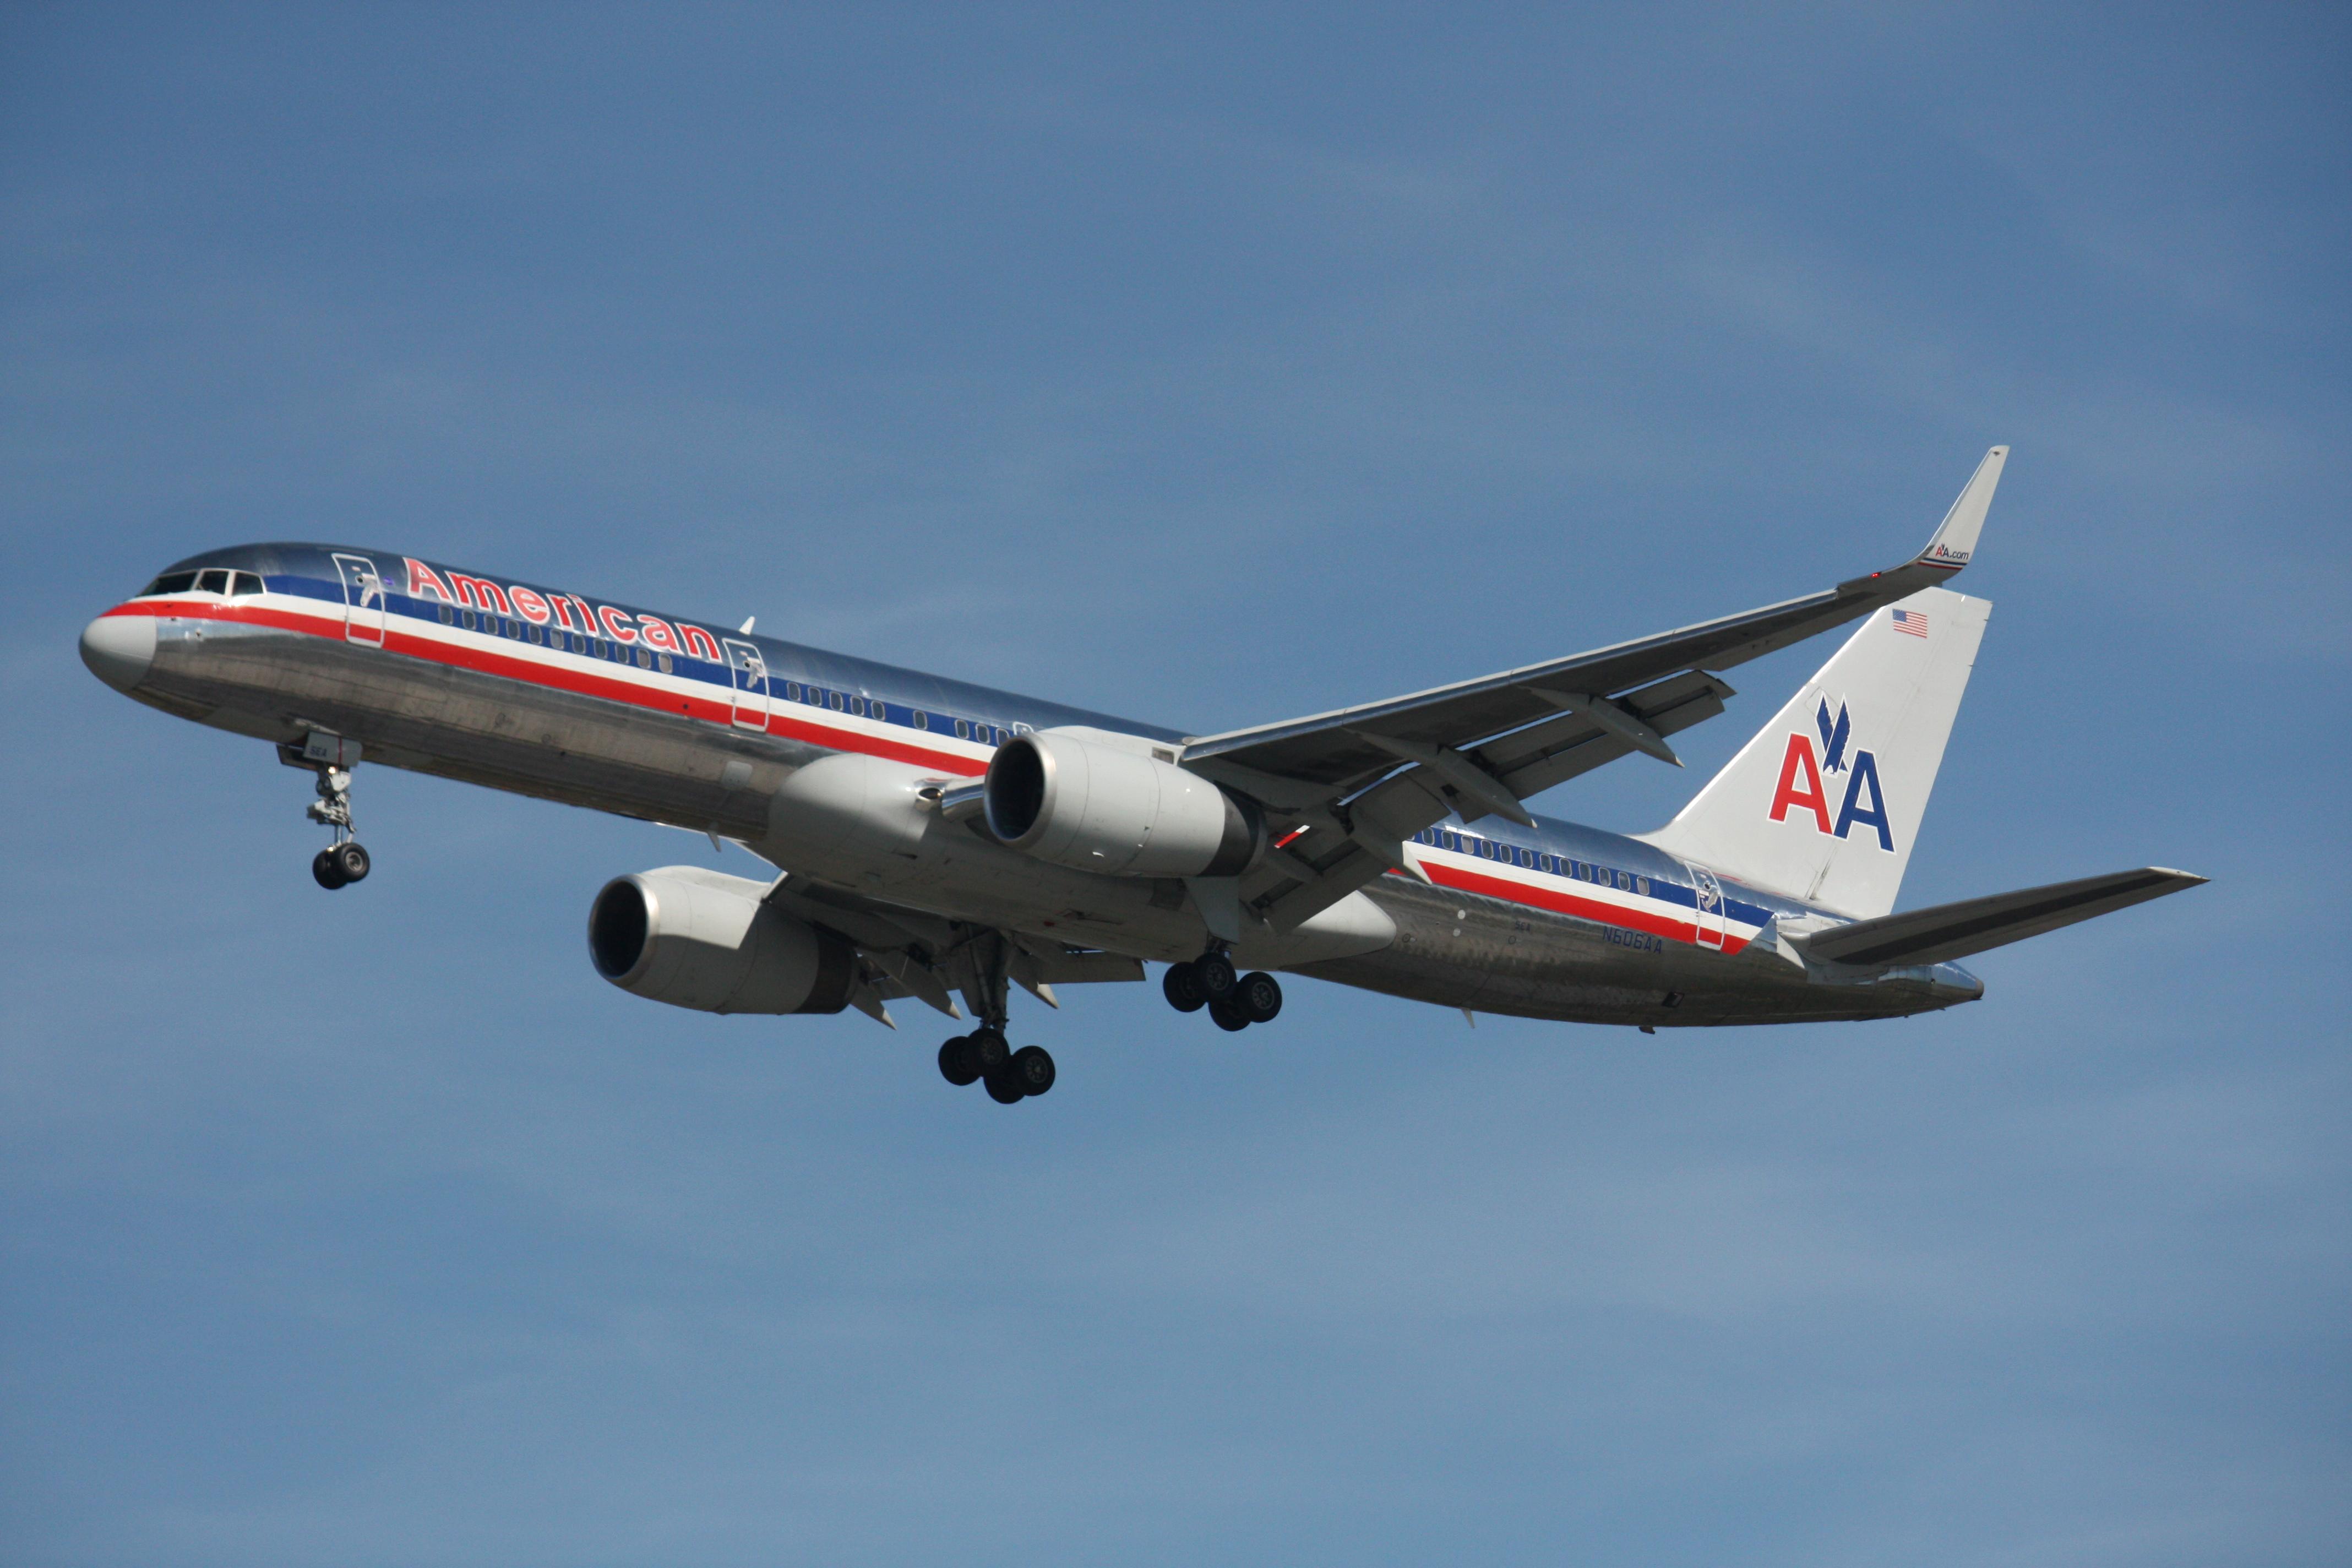 American Airlines Flight 965